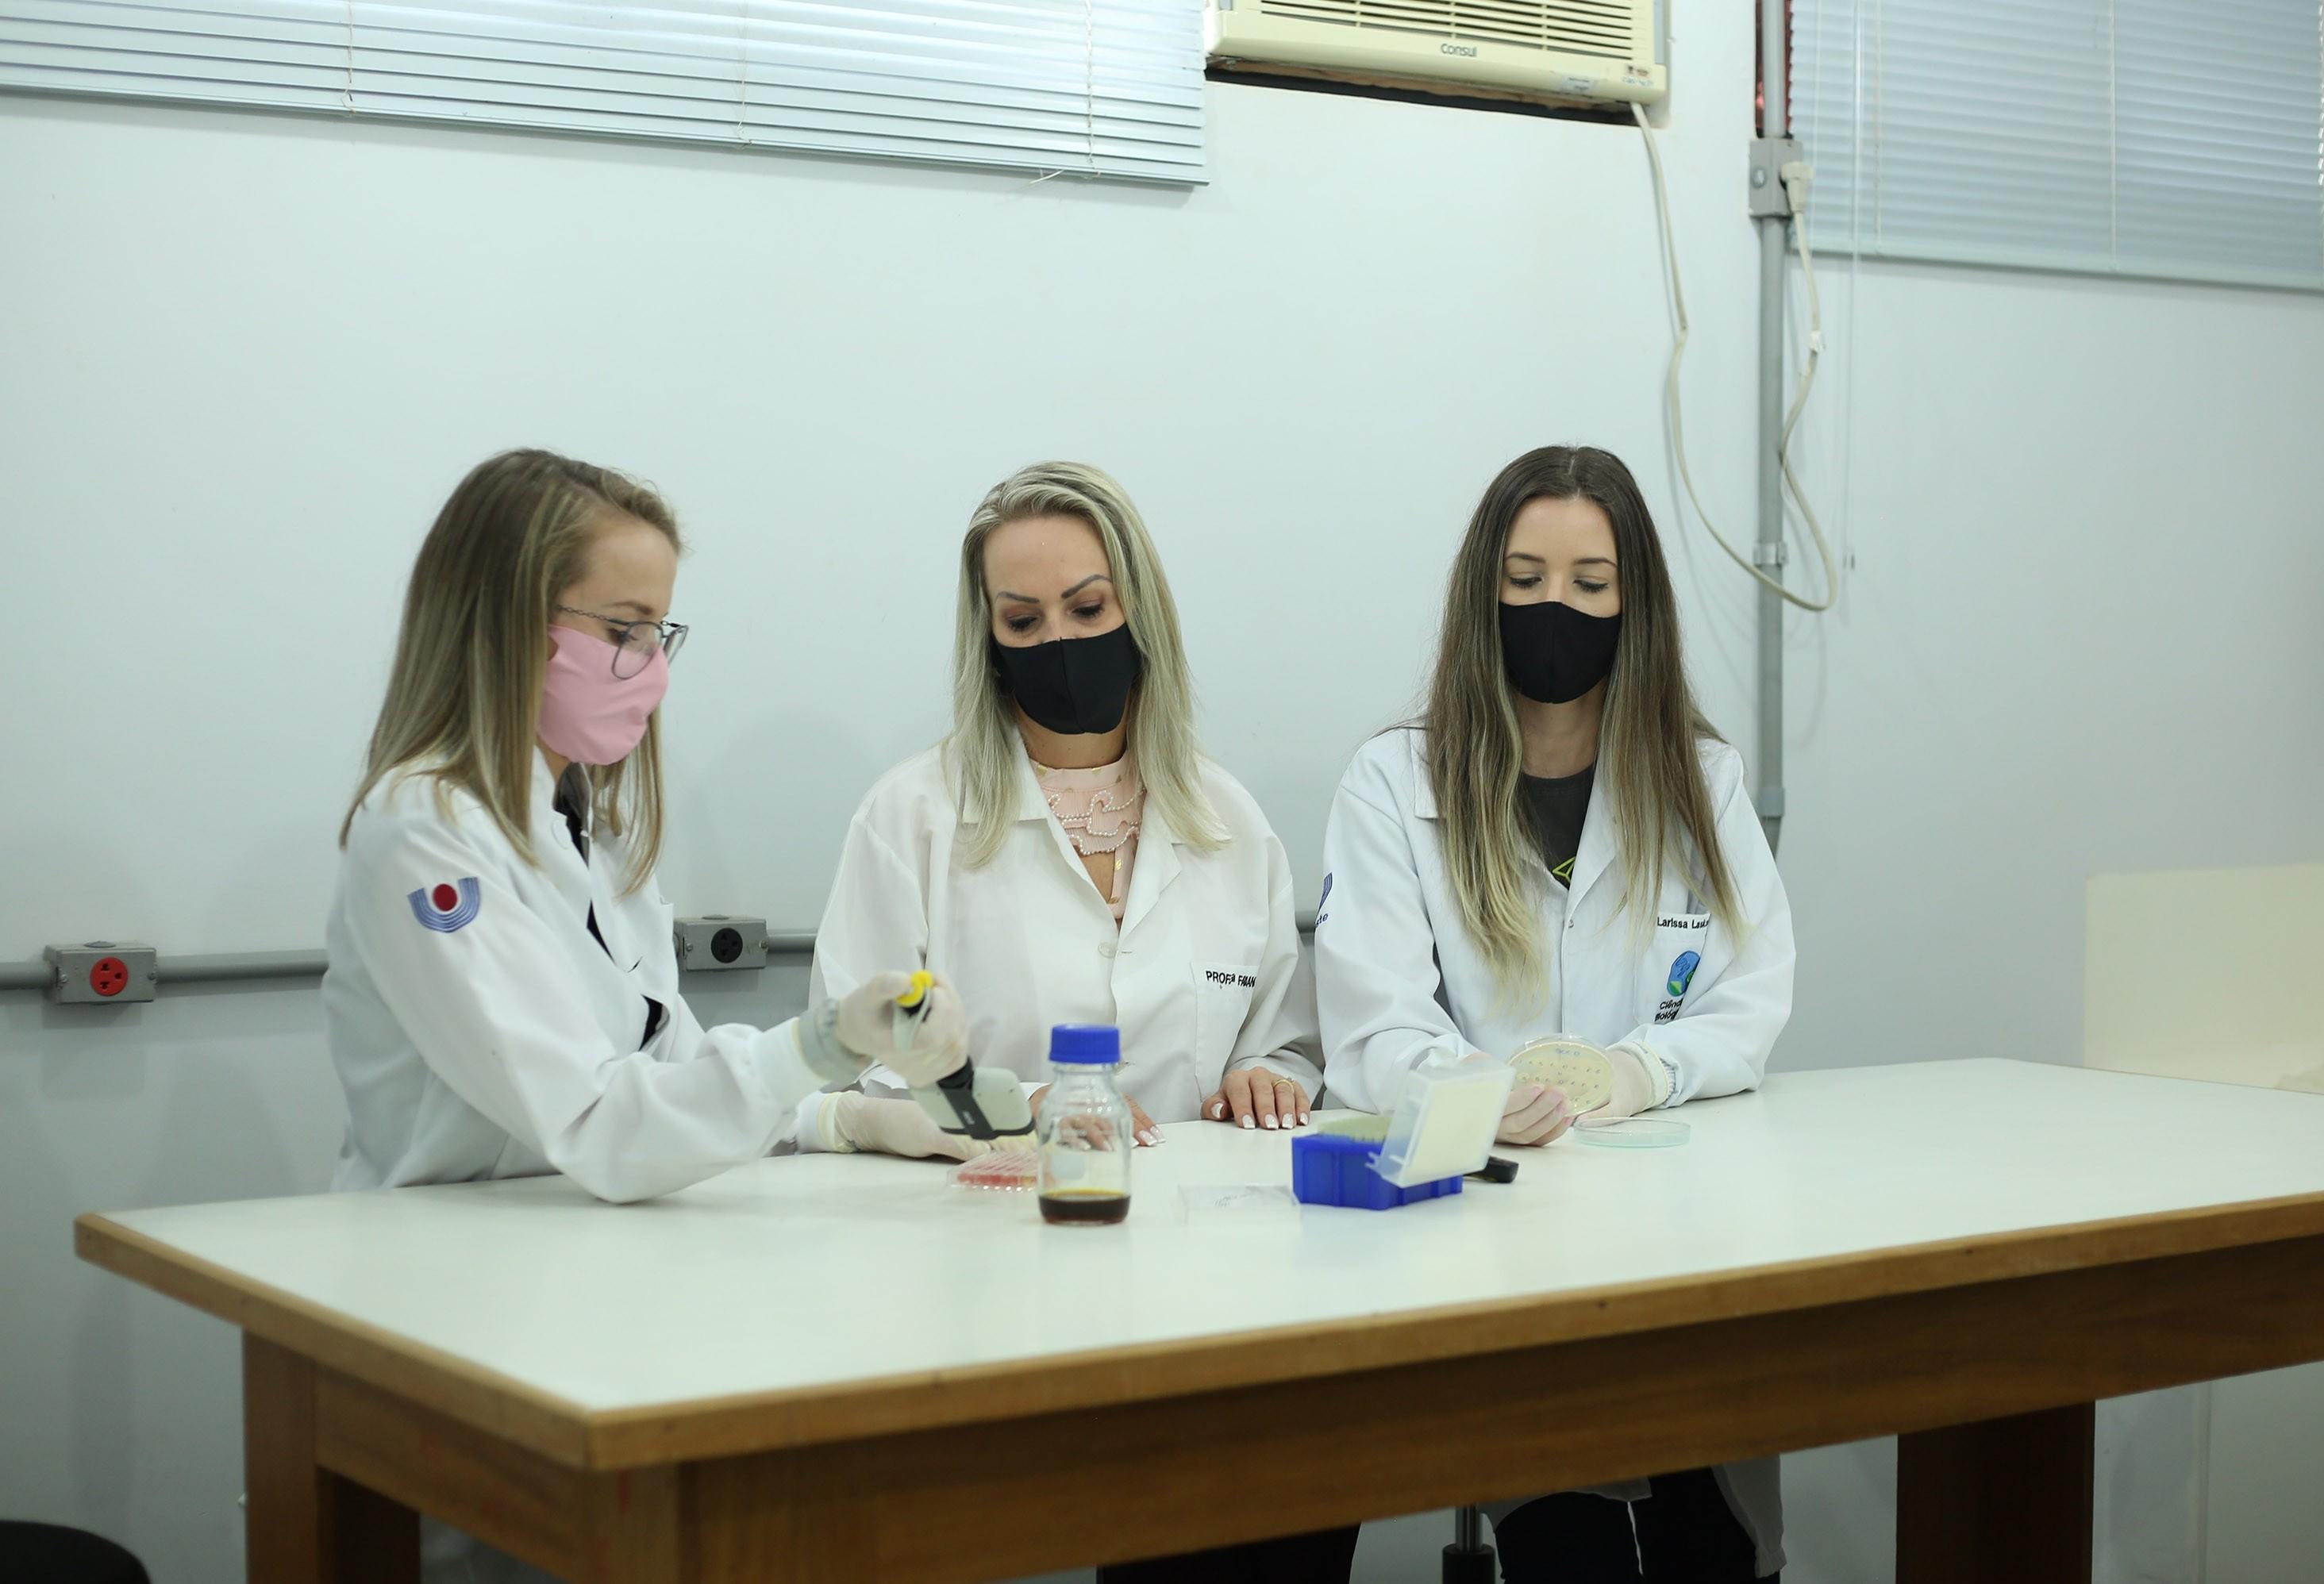 Pesquisa da Unioeste busca bioativos naturais contra bactérias, fungos e vírus